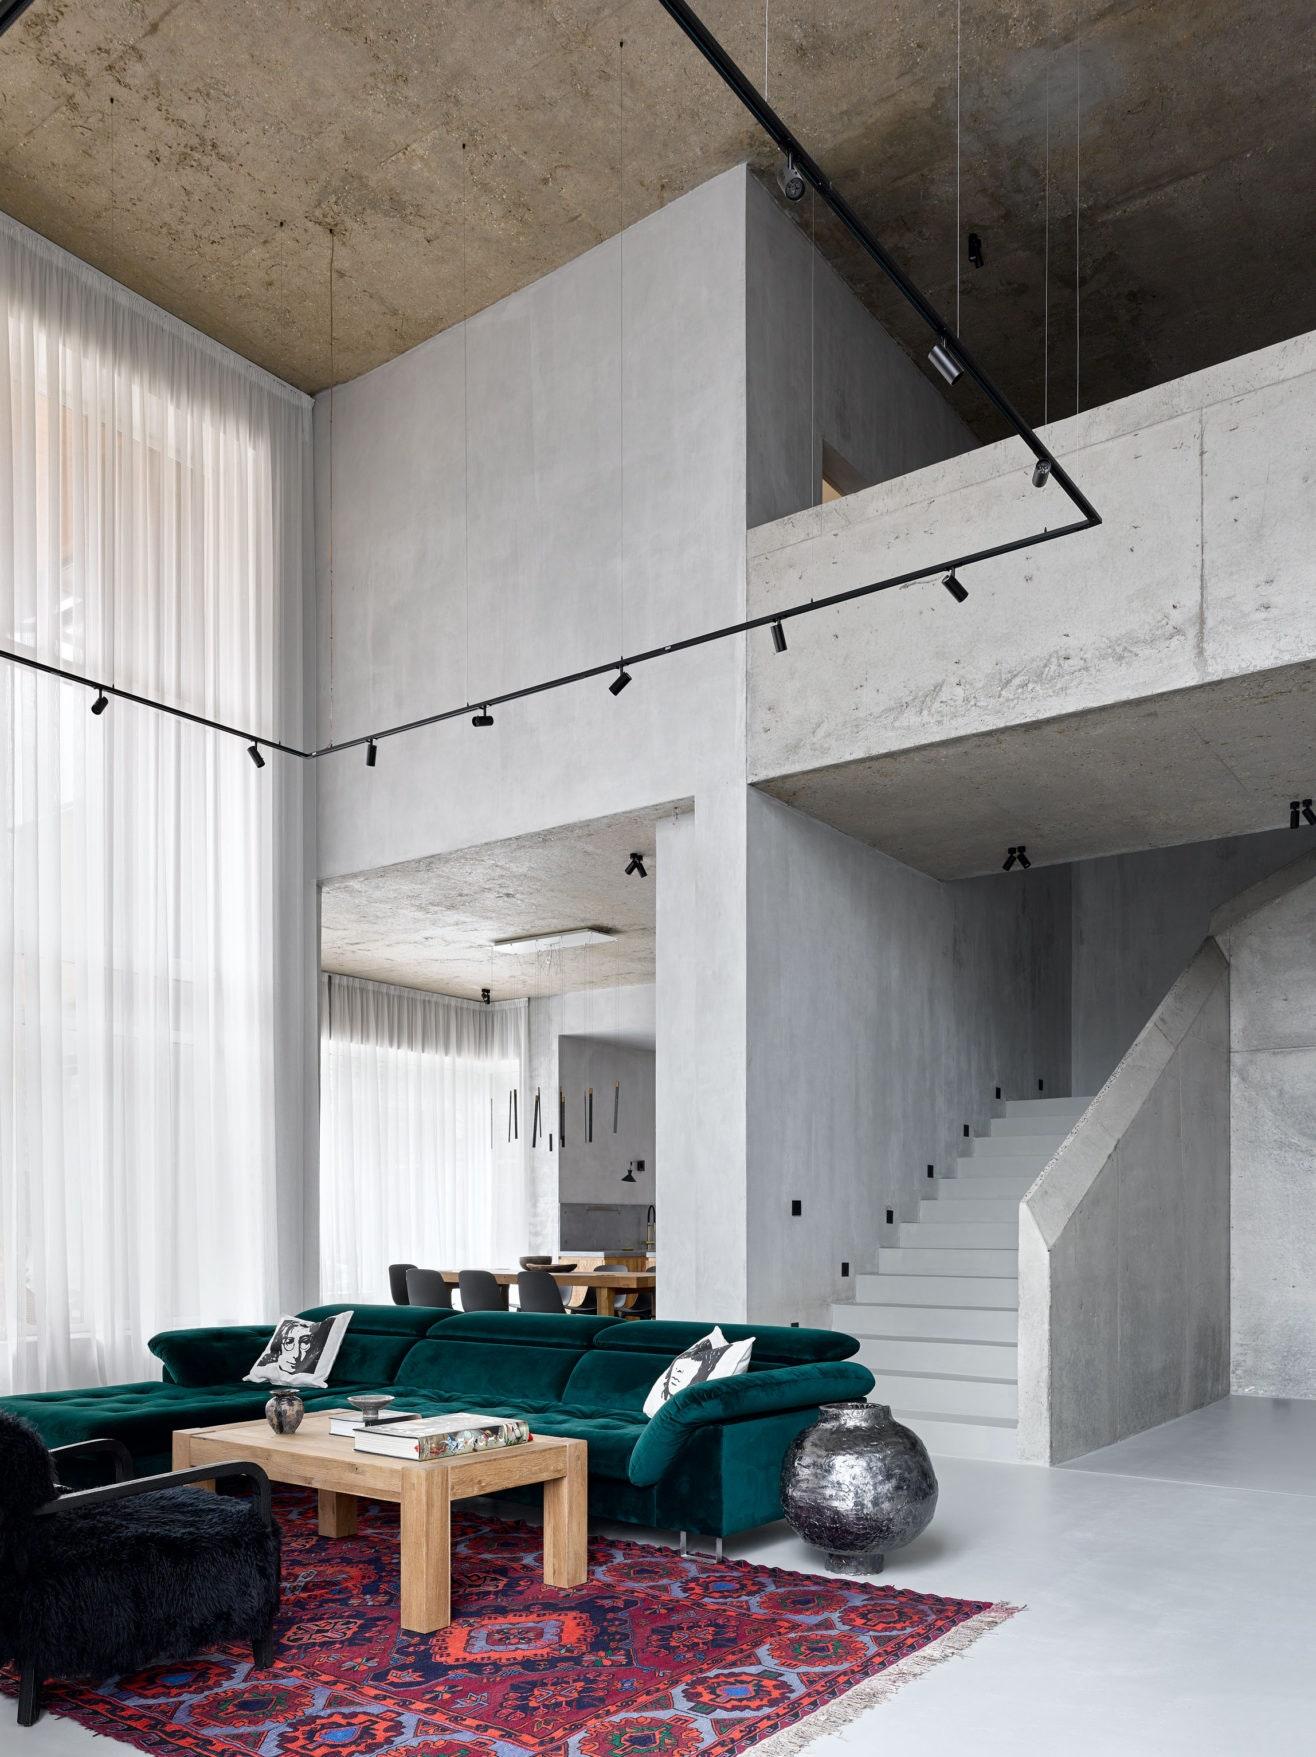 .            .             .              .          Halo    Home Concept   01001011.   .     .